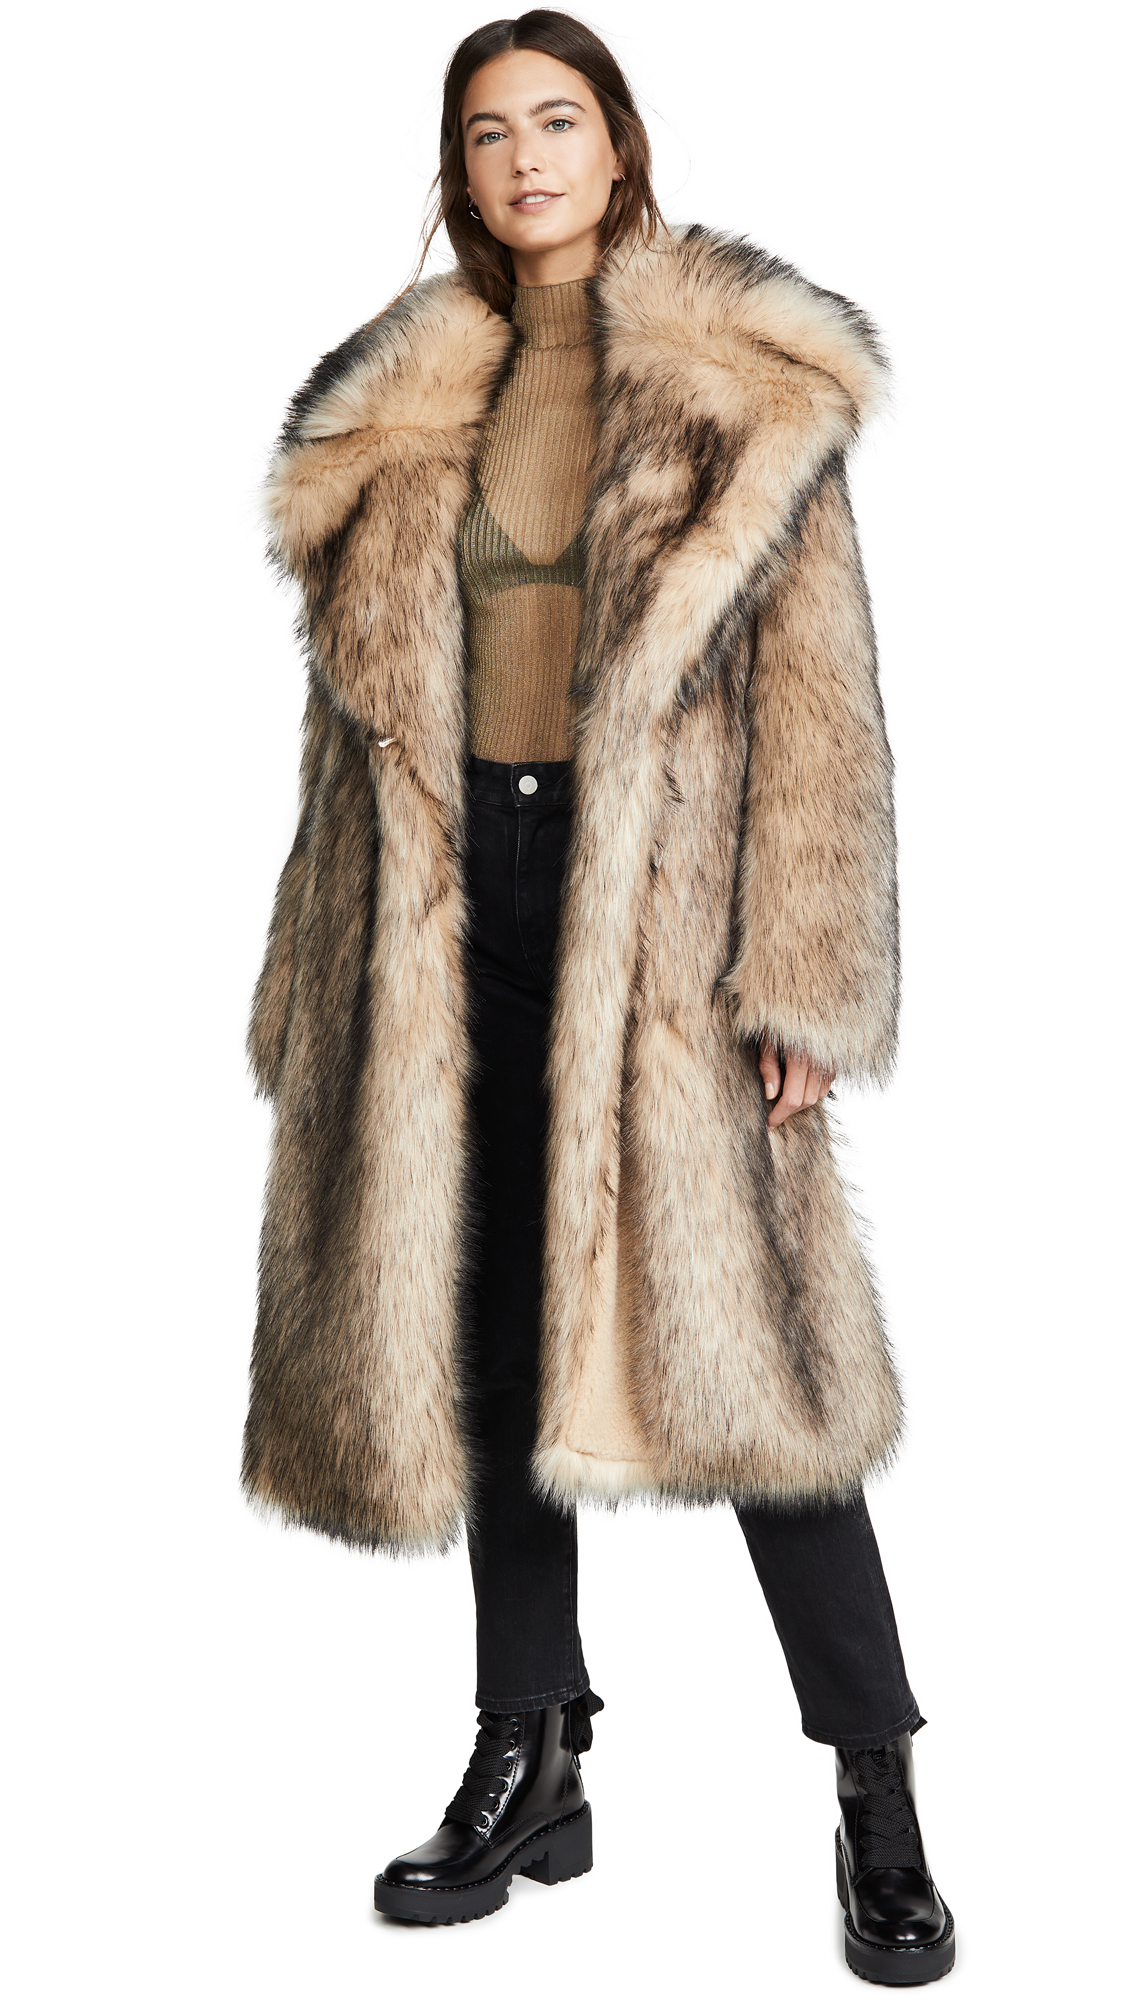 Buy Paco Rabanne Fur Coat online beautiful Paco Rabanne Clothing, Jackets